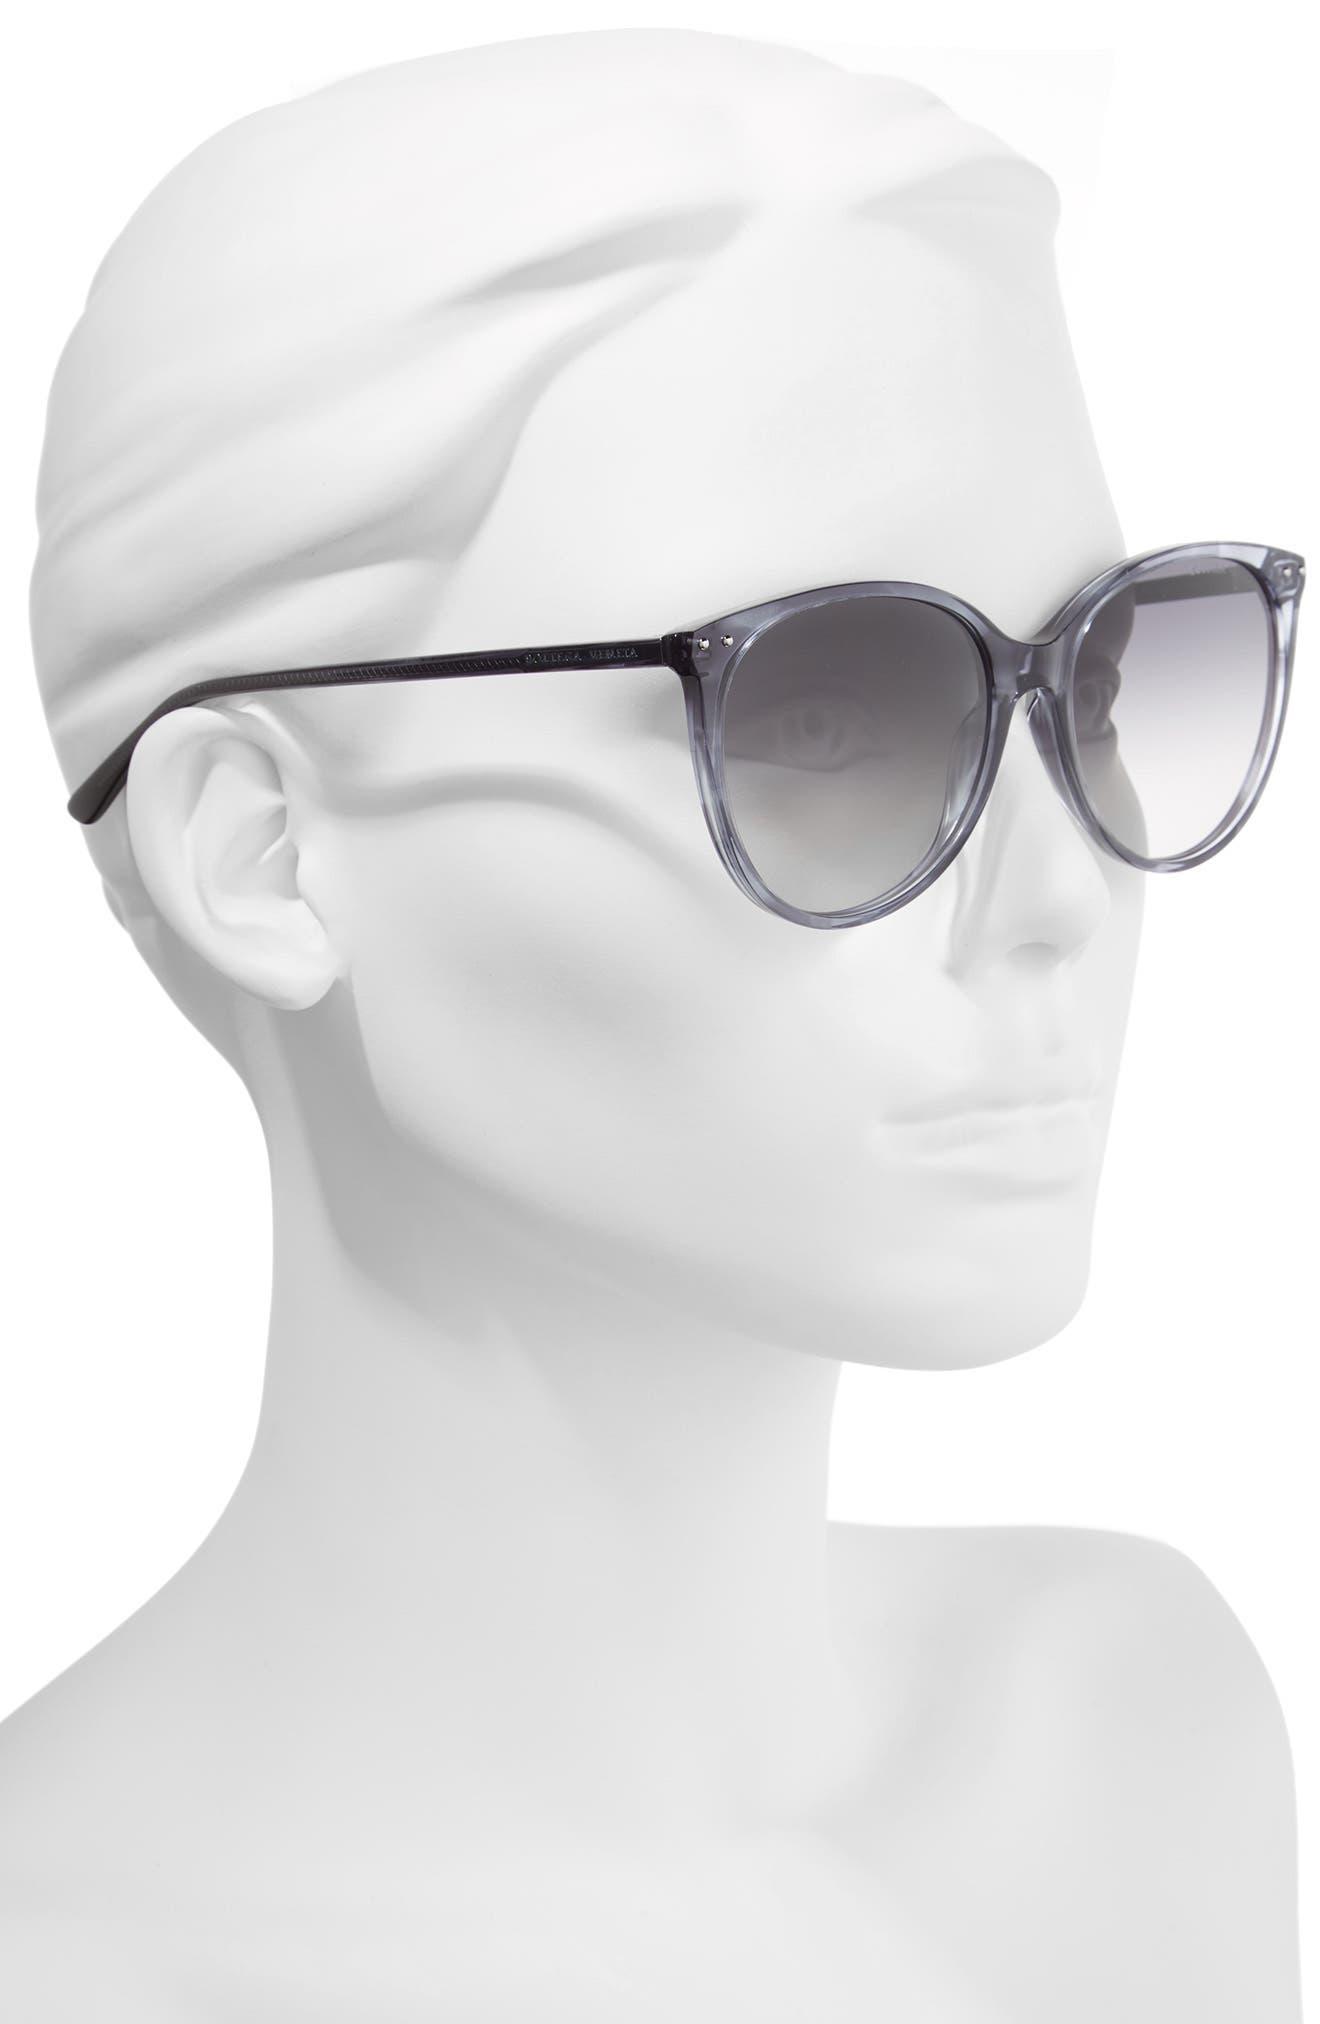 55mm Cat Eye Sunglasses,                             Alternate thumbnail 2, color,                             GREY